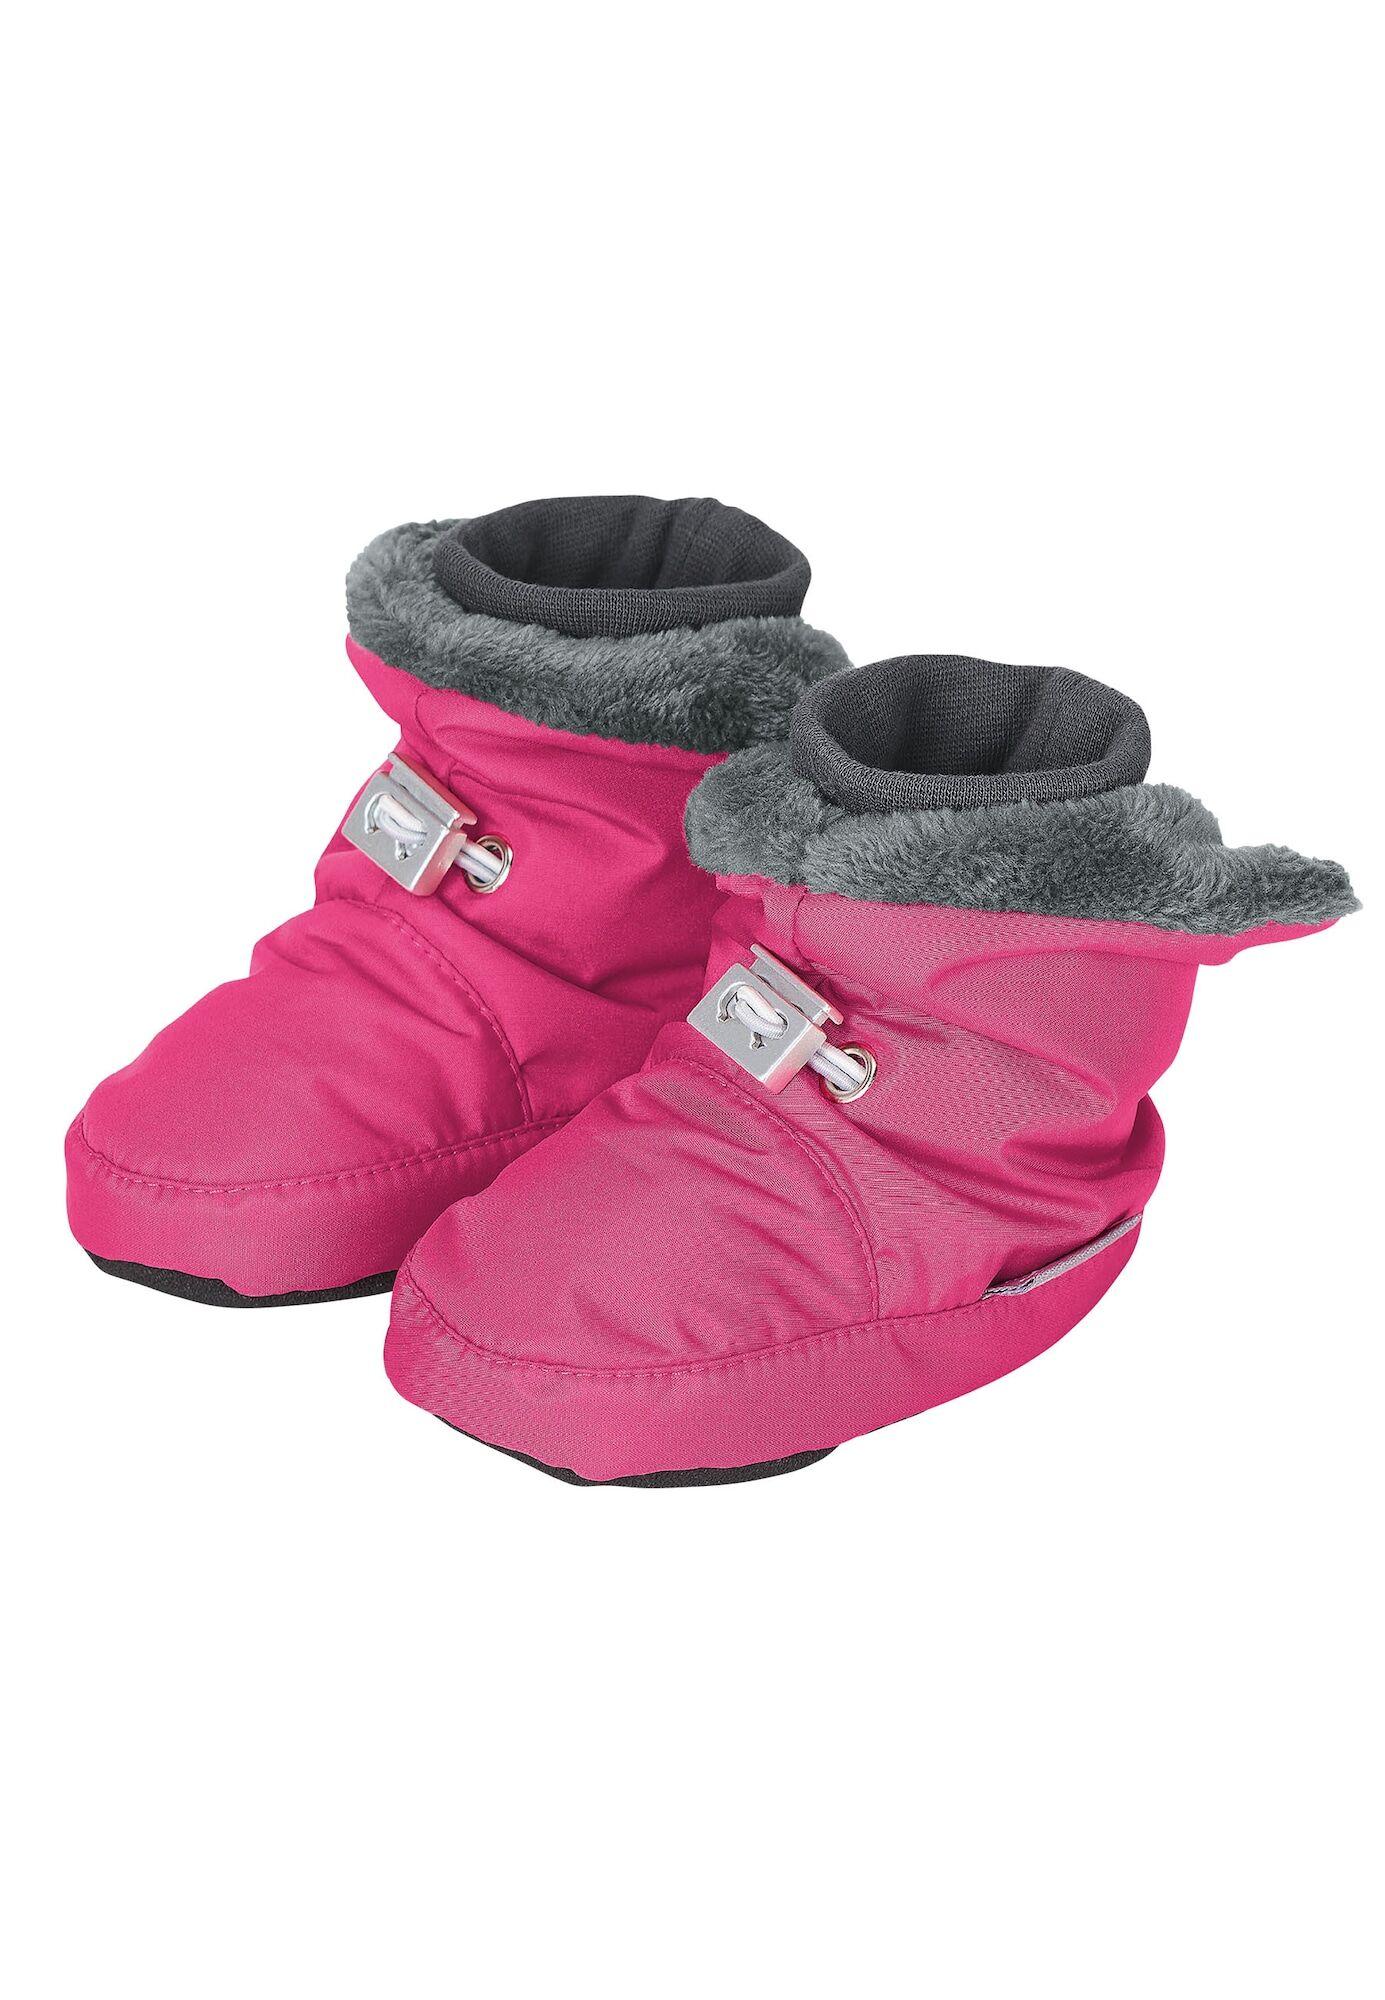 STERNTALER Bottes de neige  - Rose - Taille: 22 - kids